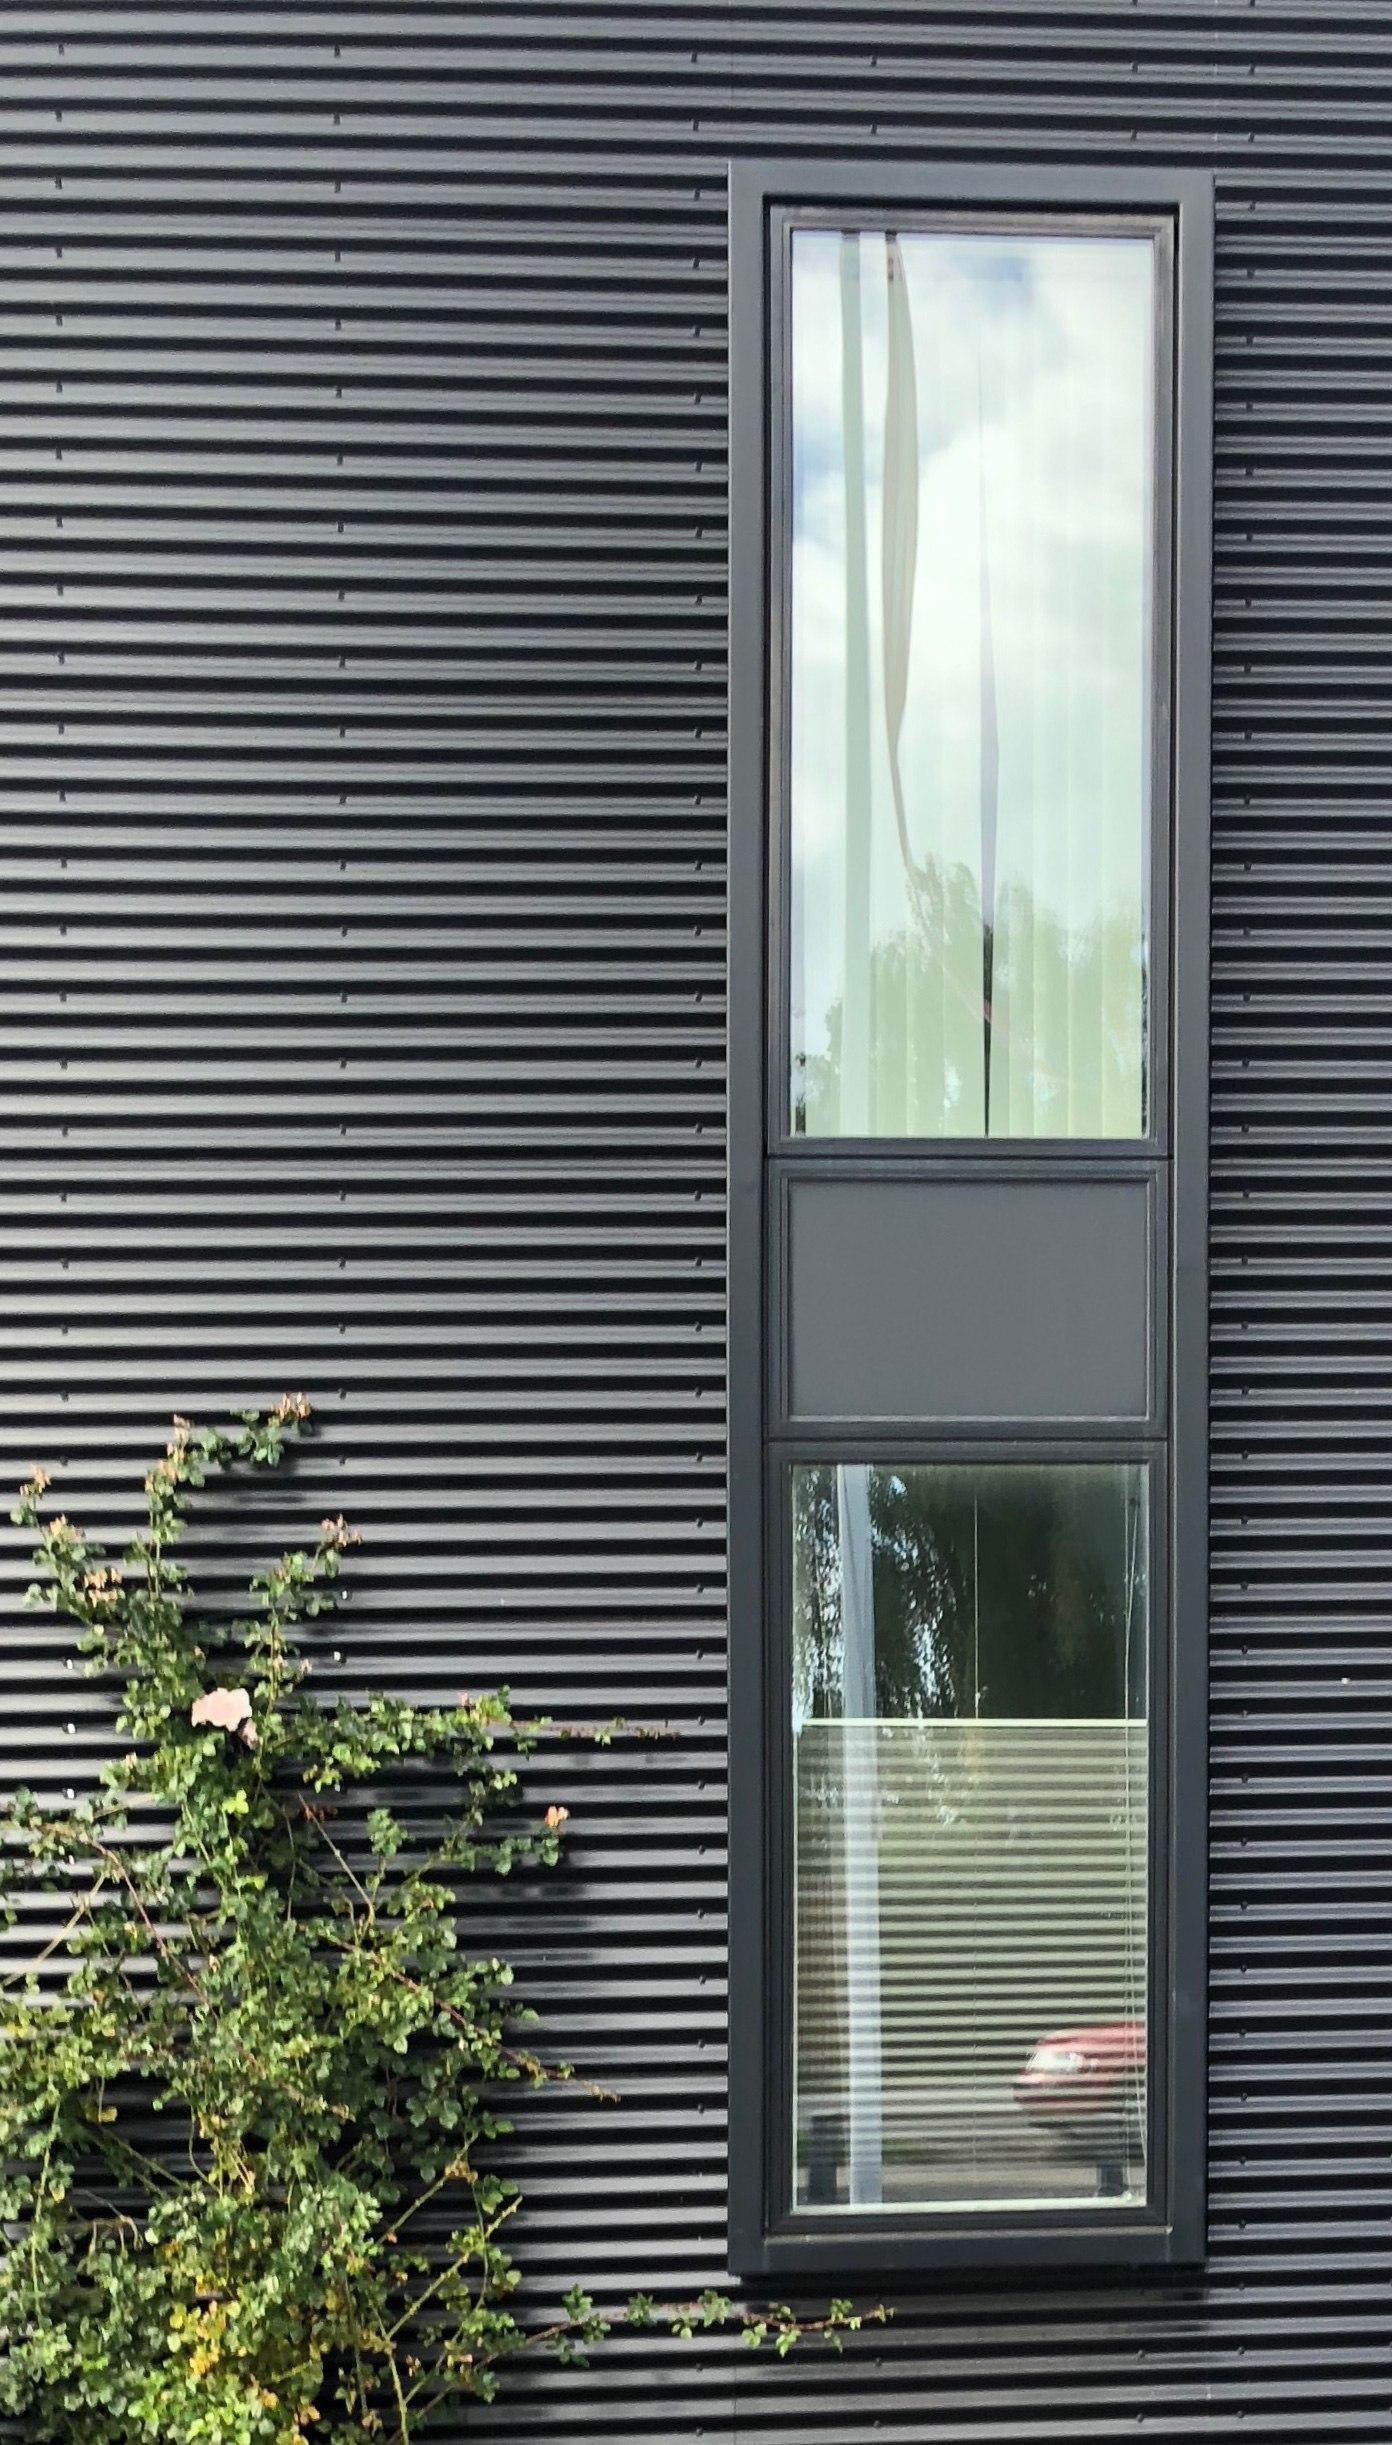 Klausdalsbrovej-ONV-arkitekter-1